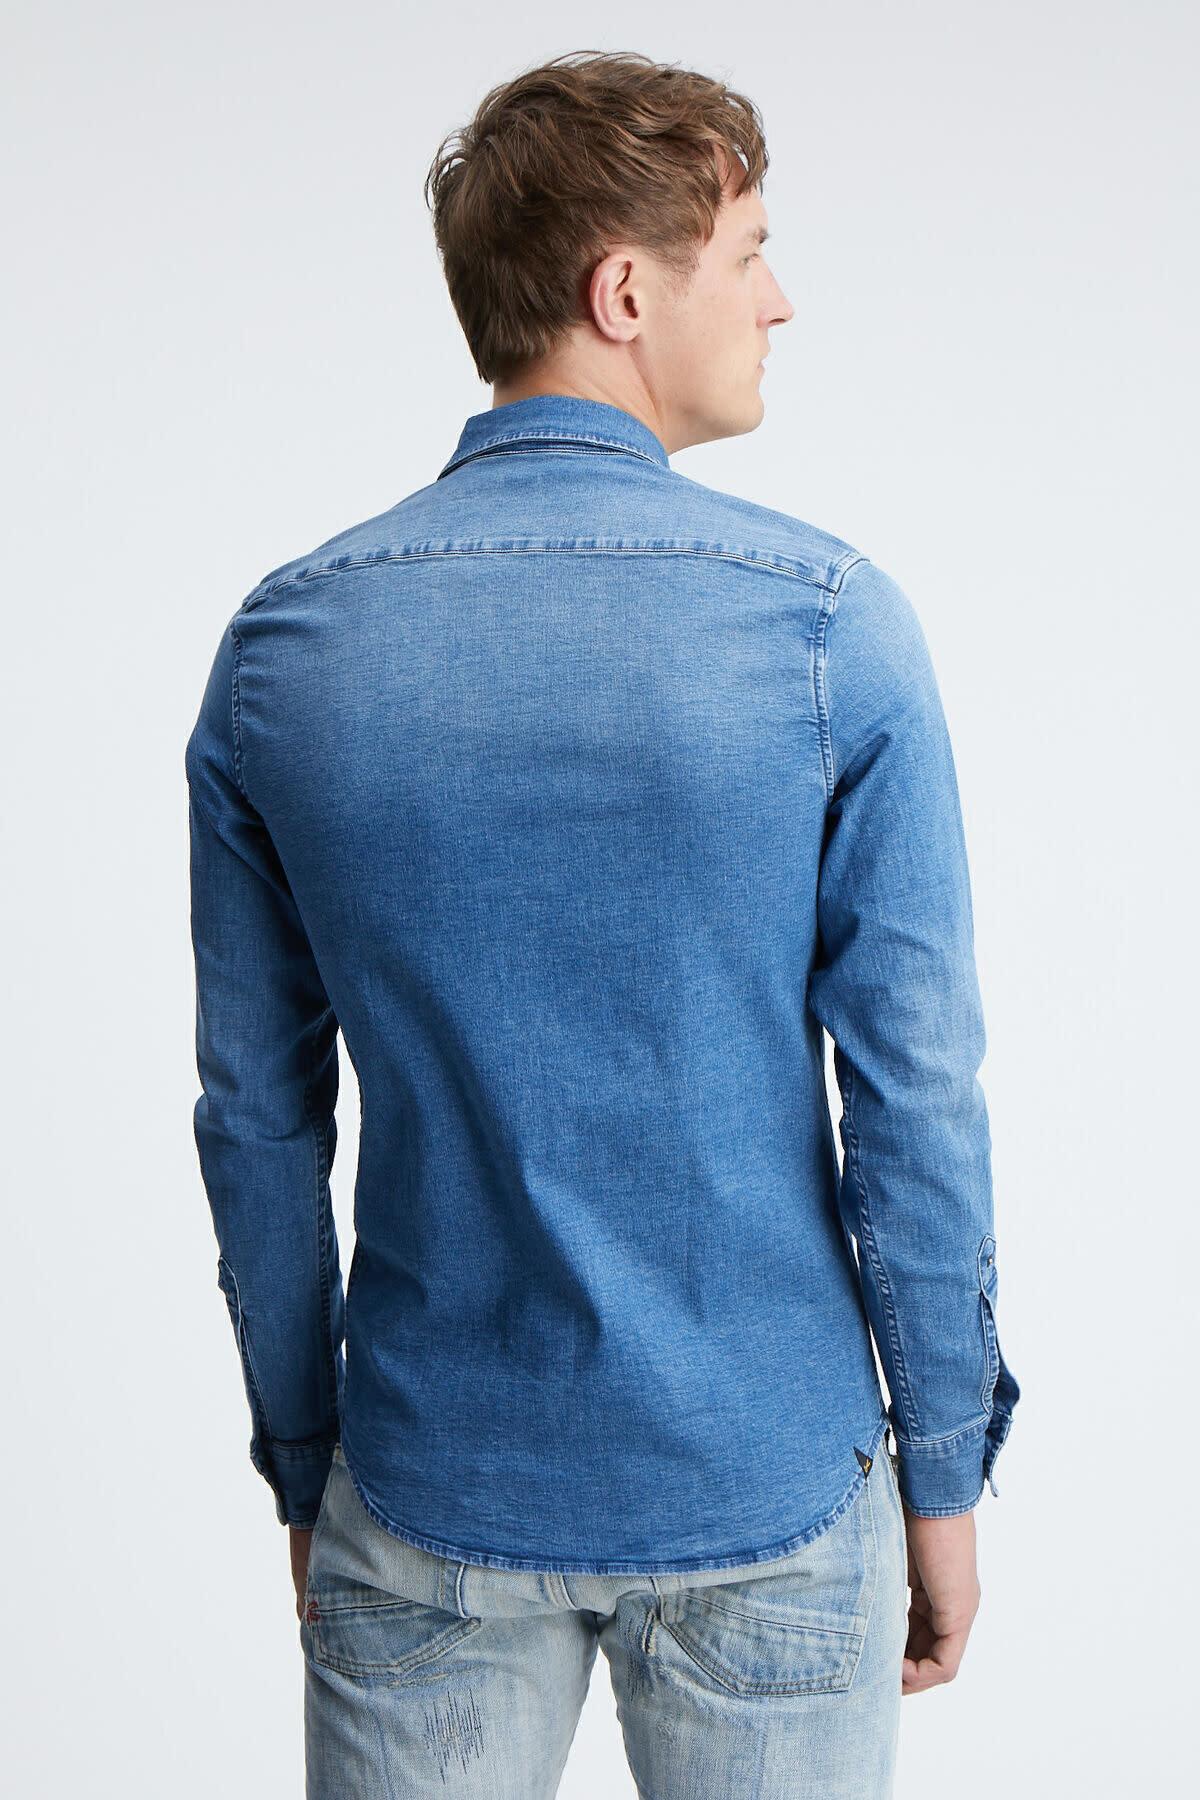 Charly Denim Shirt-2